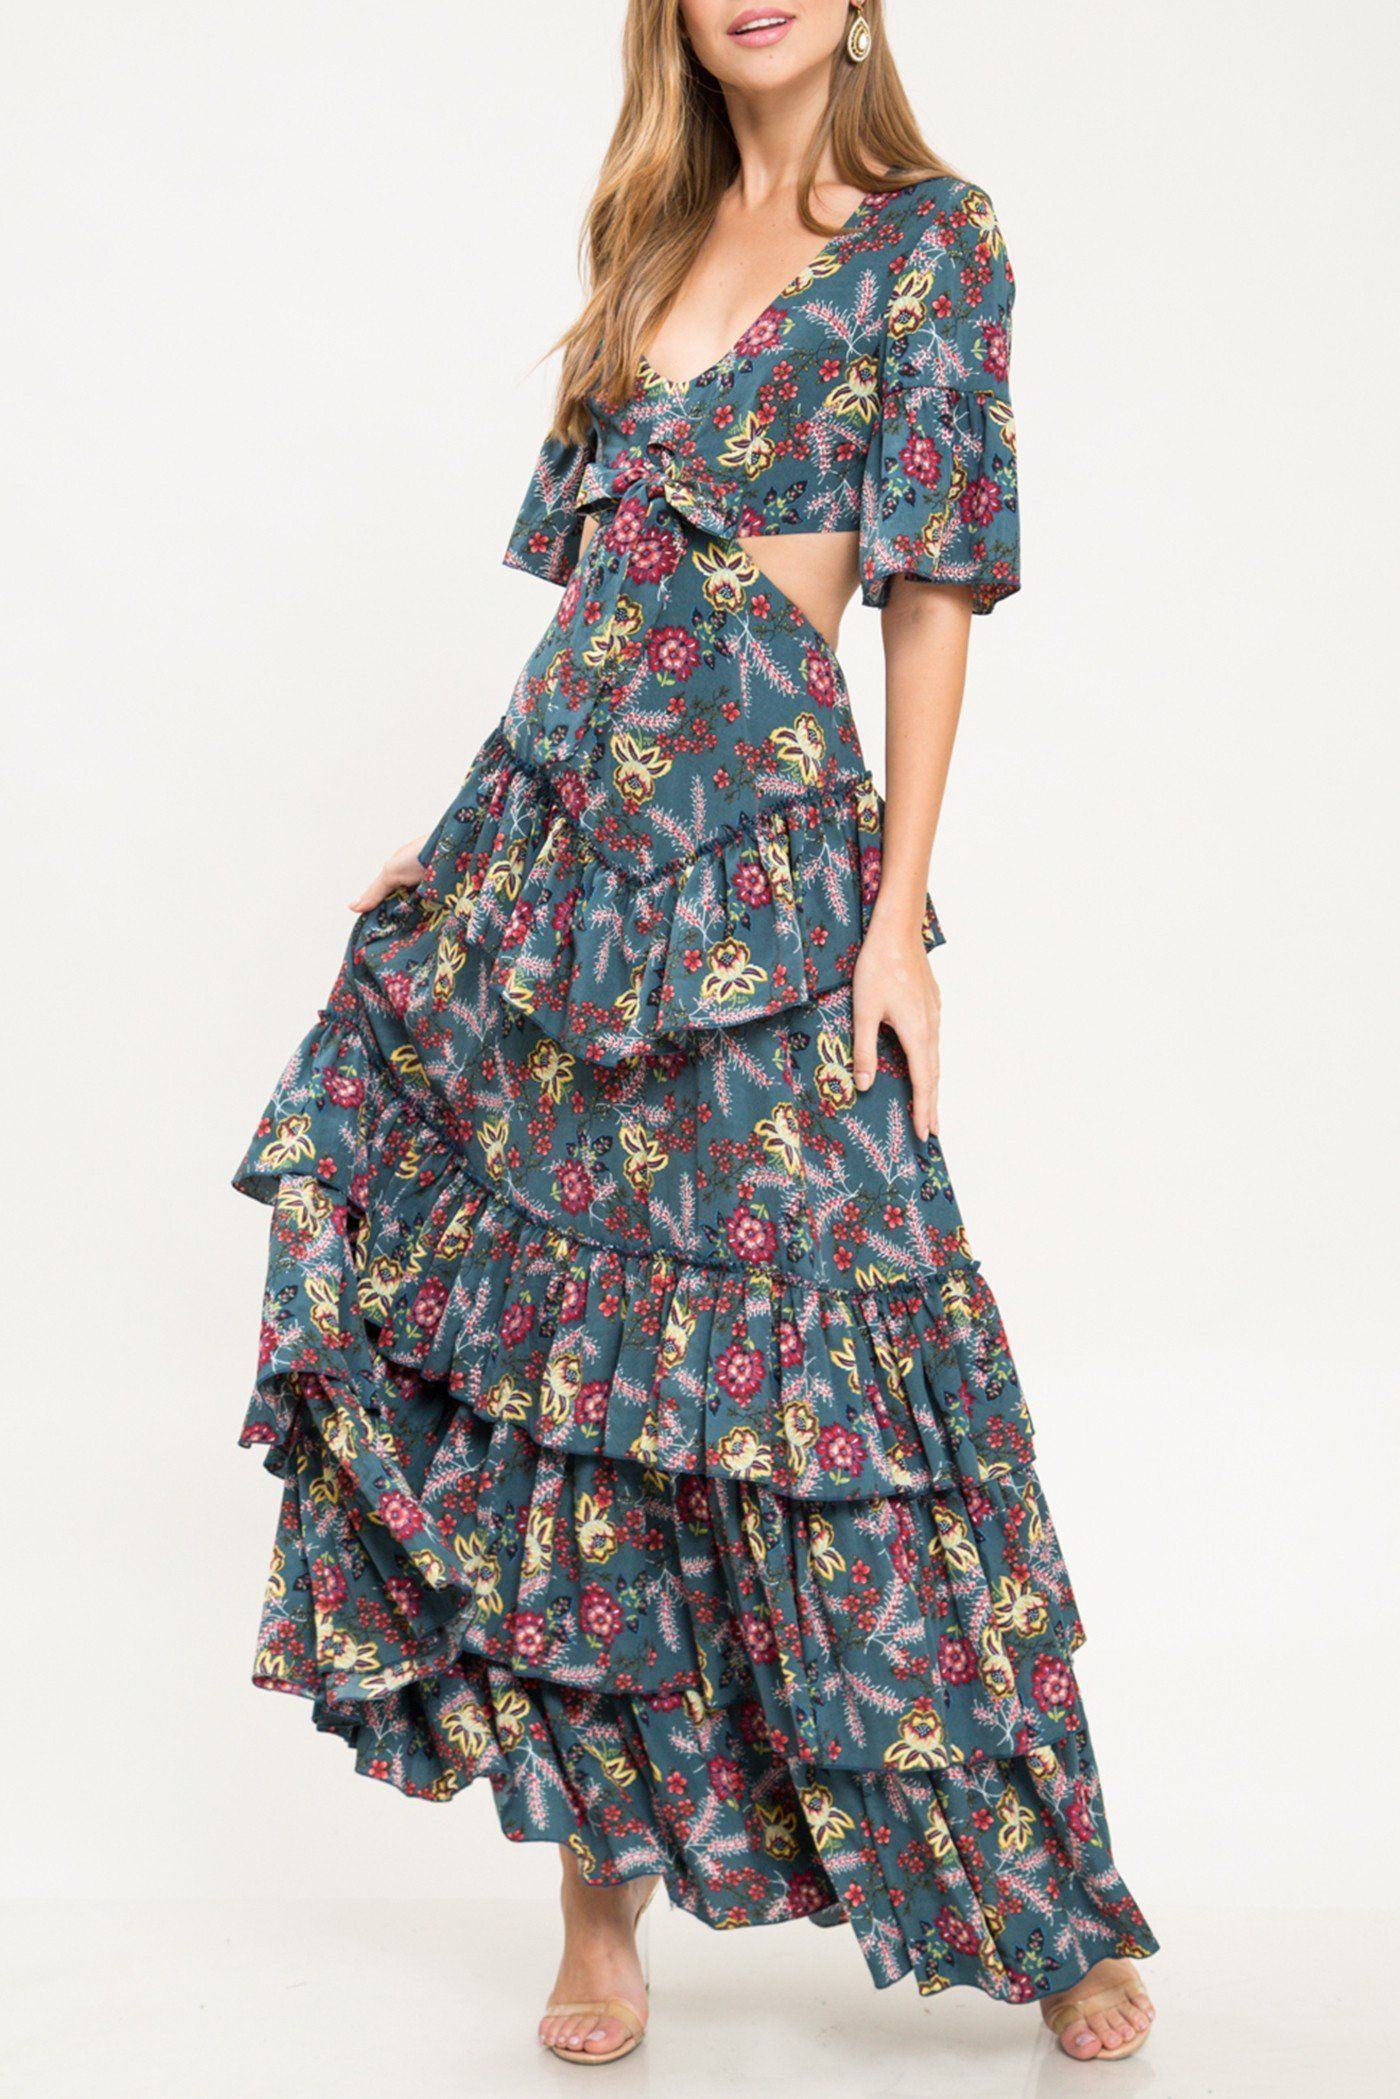 Pin By Dominika Franaszczyk On Style Cutout Maxi Dress Maxi Dress Dresses [ 2099 x 1400 Pixel ]